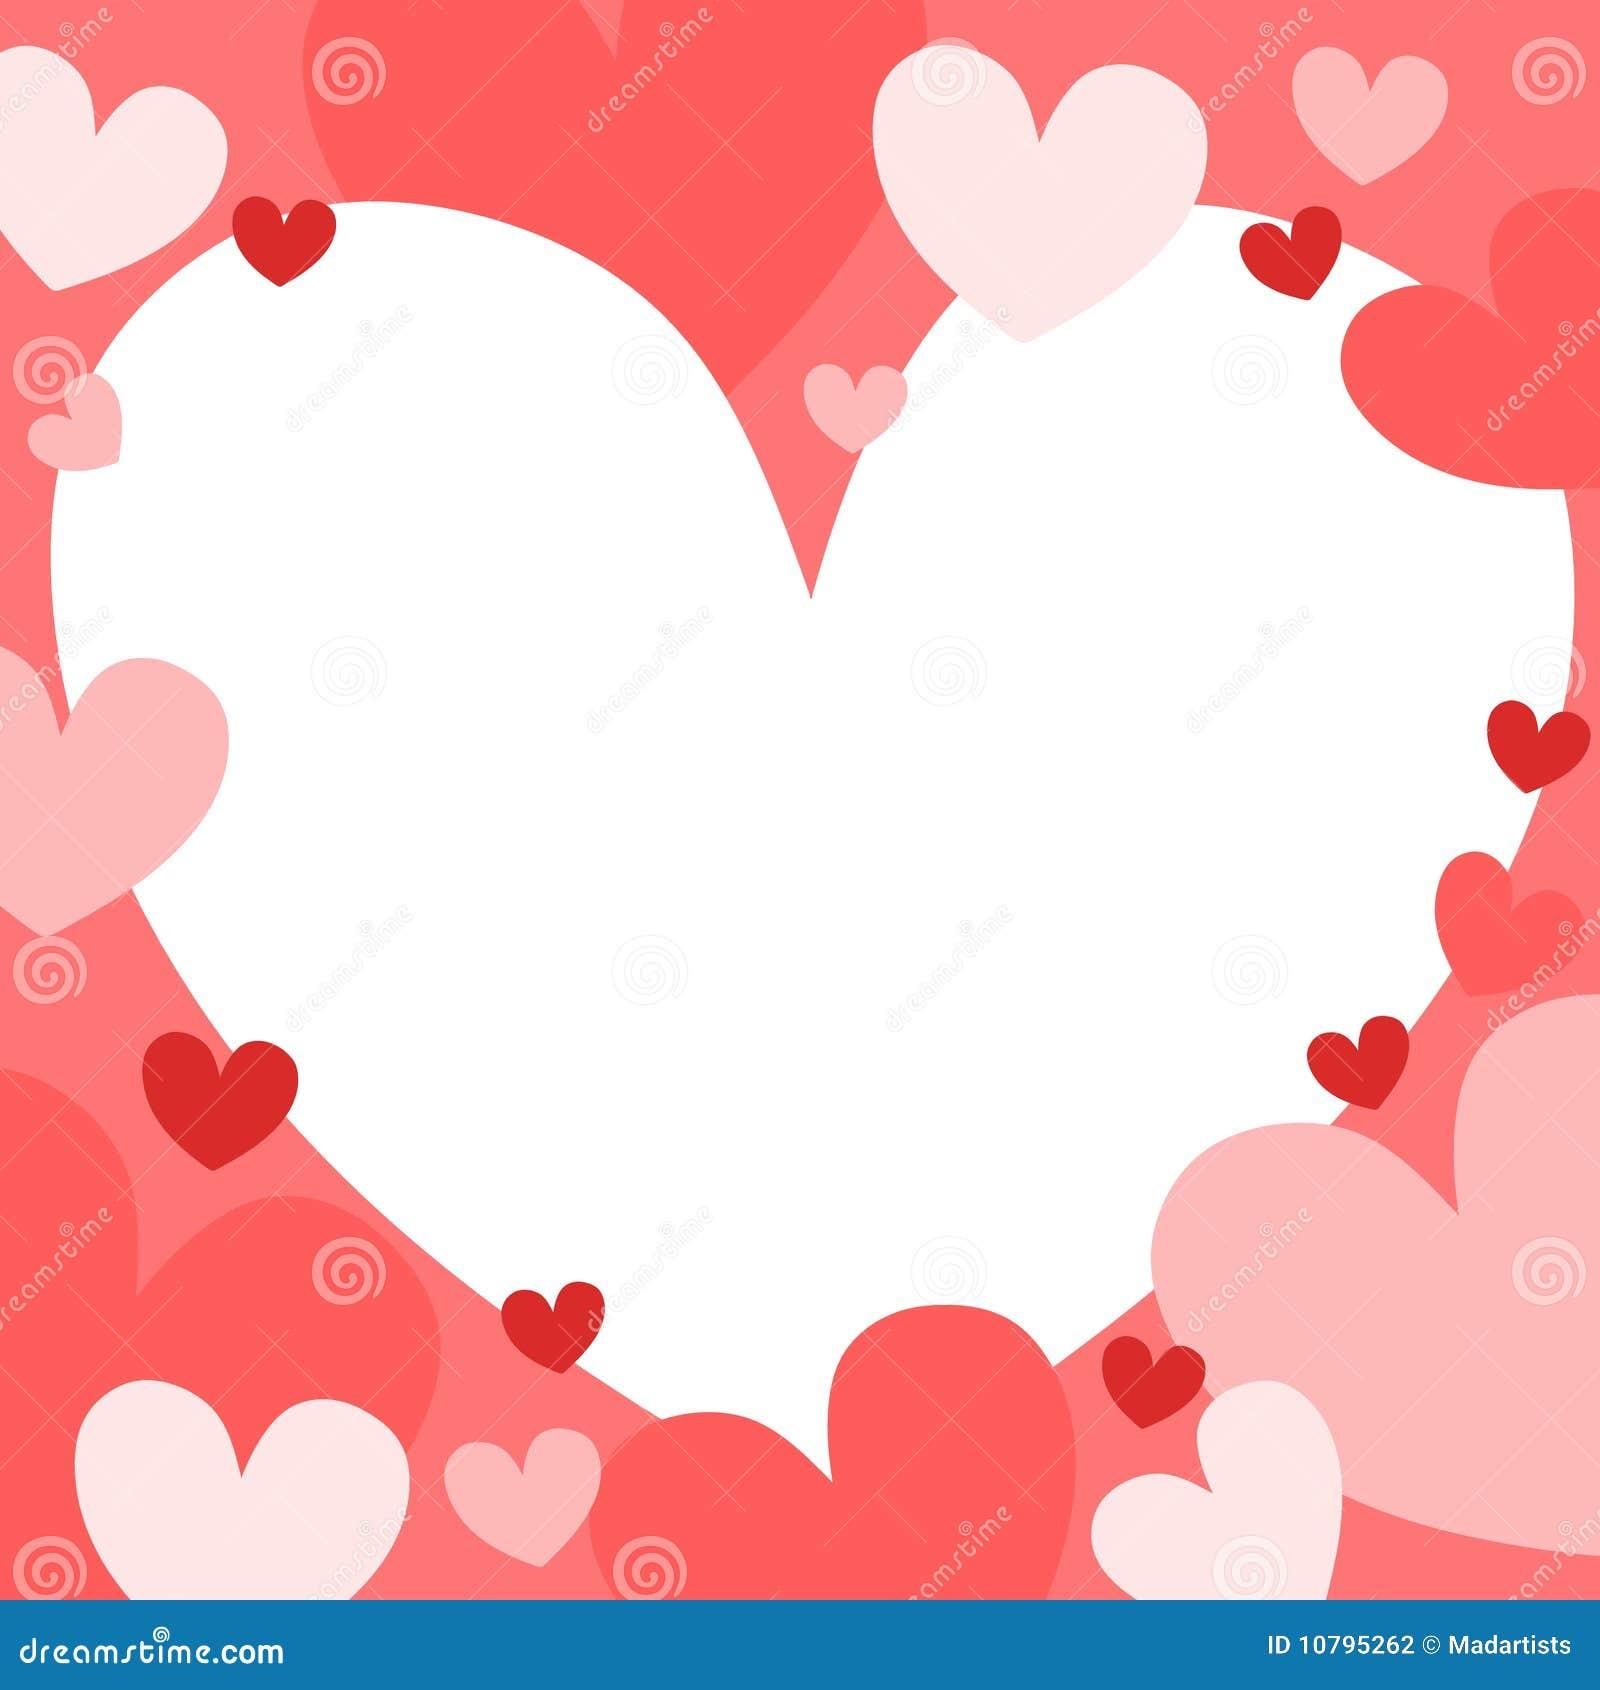 Pastel Hearts Background 2 Stock Photography Image 10795262